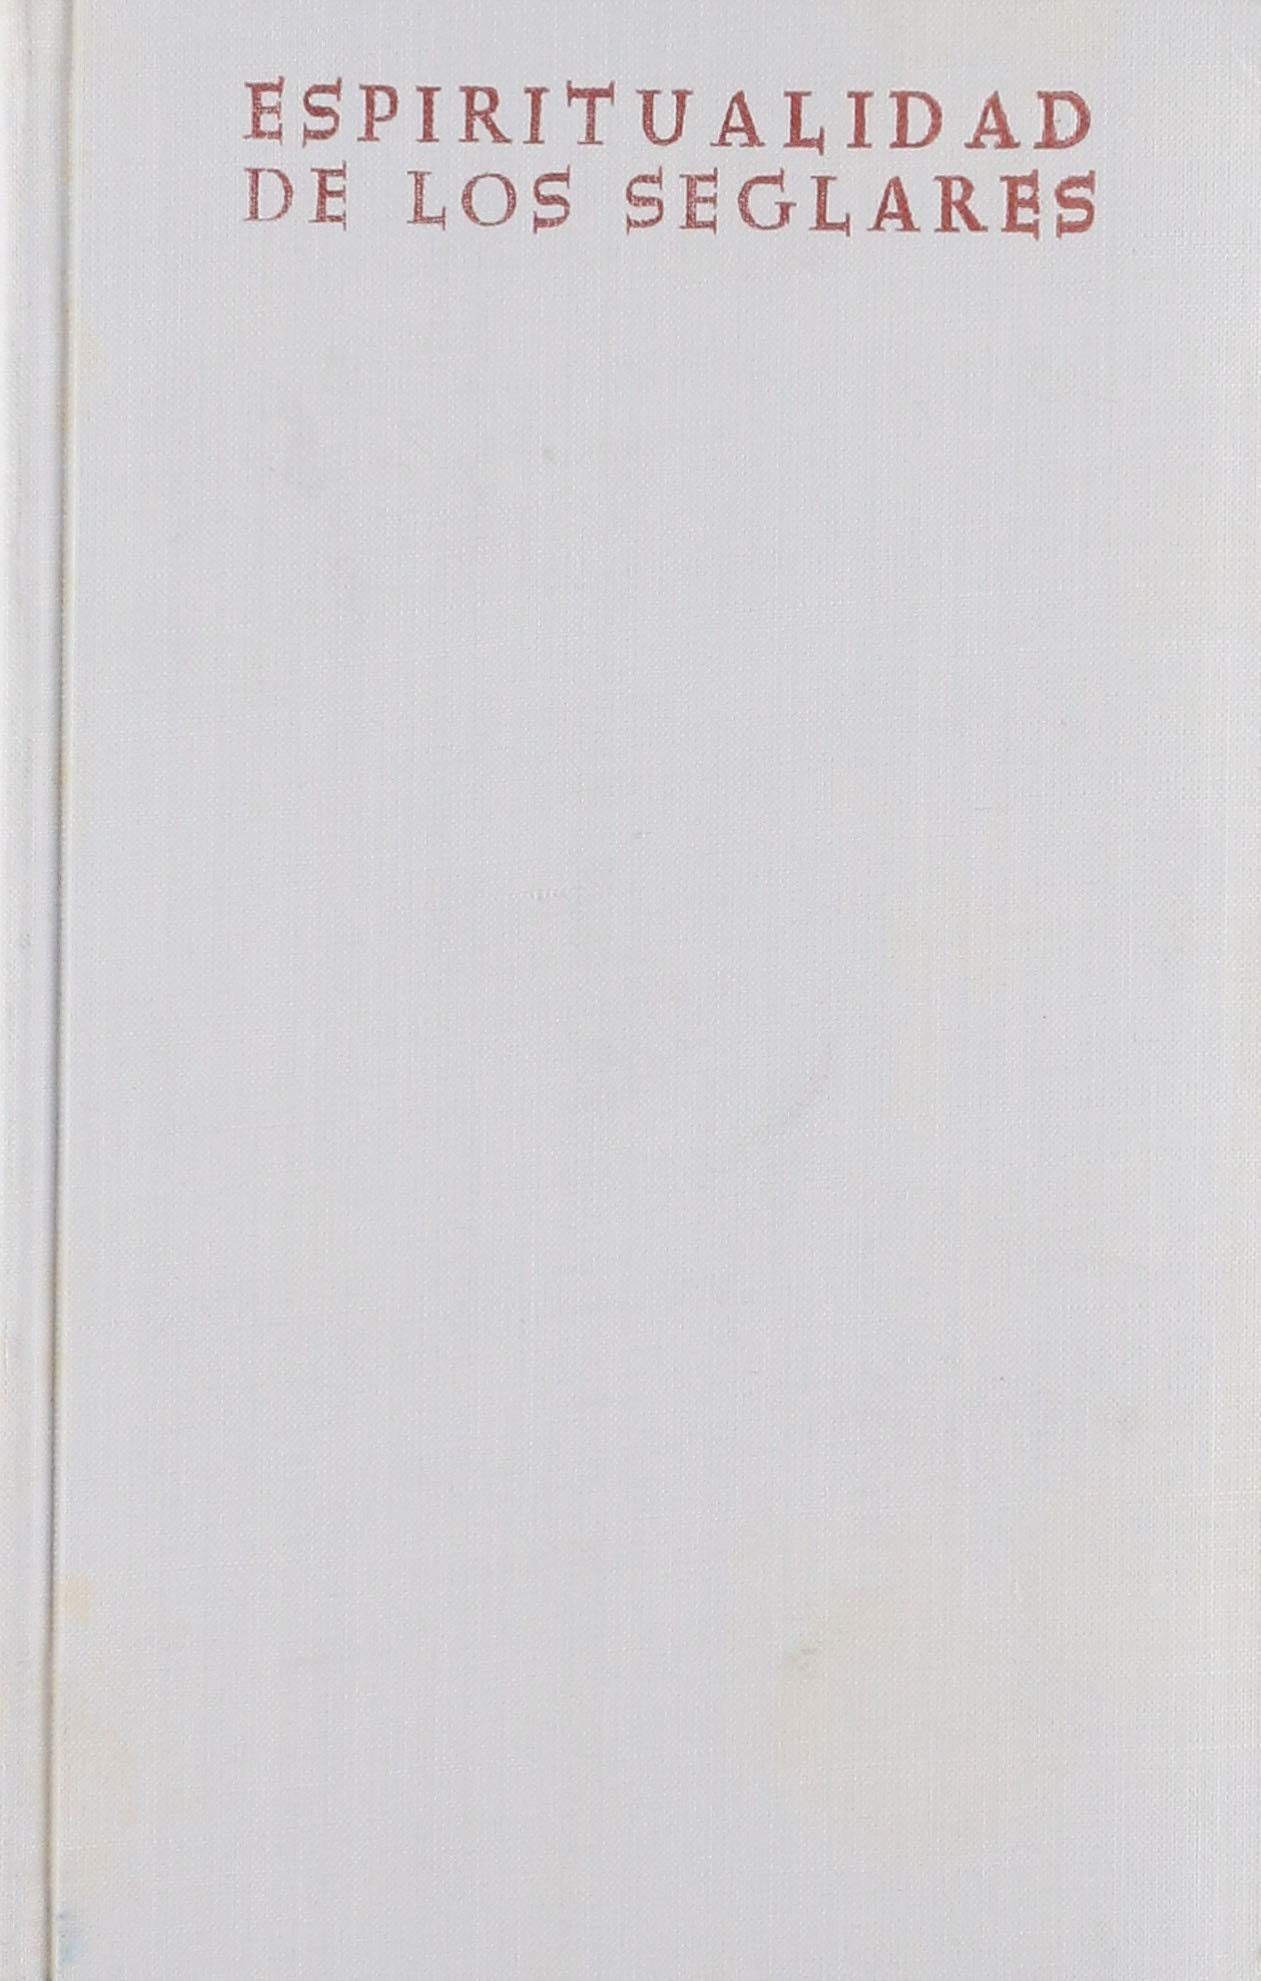 Espiritualidad de los seglares: Antonio Royo Marín: 9788422003168: Amazon.com: Books